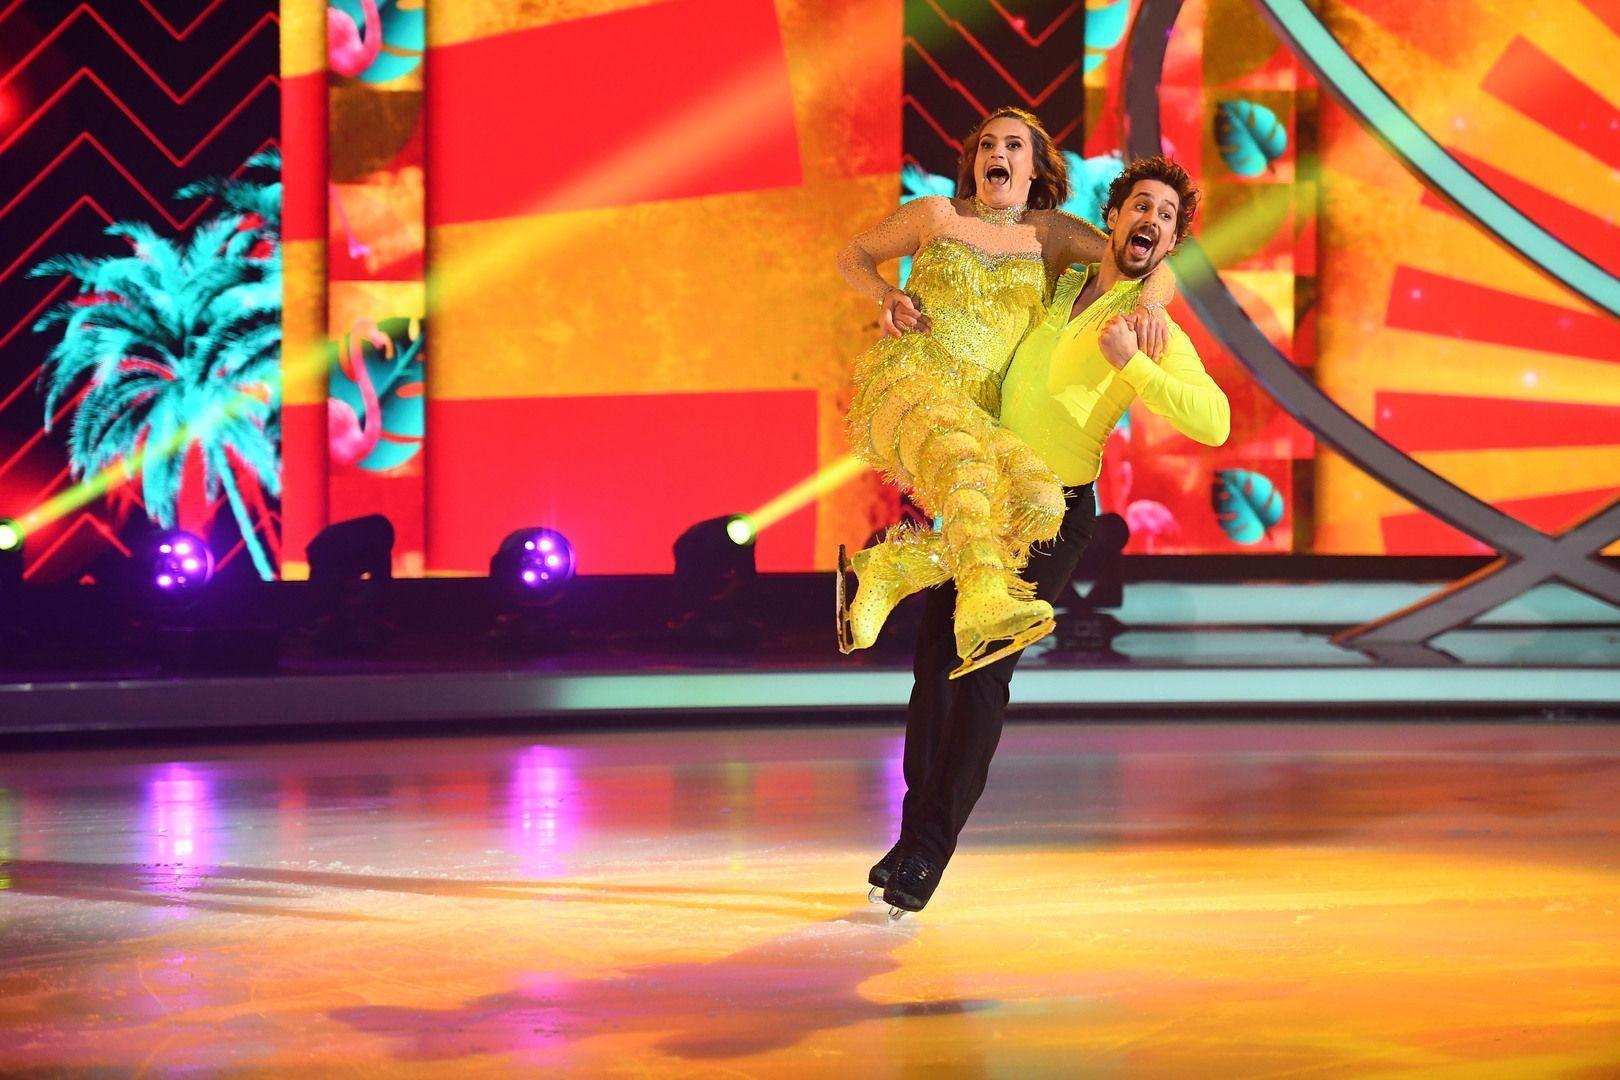 Nadine Angerer strahlt bei energiegeladener Dancing on Ice-Kür